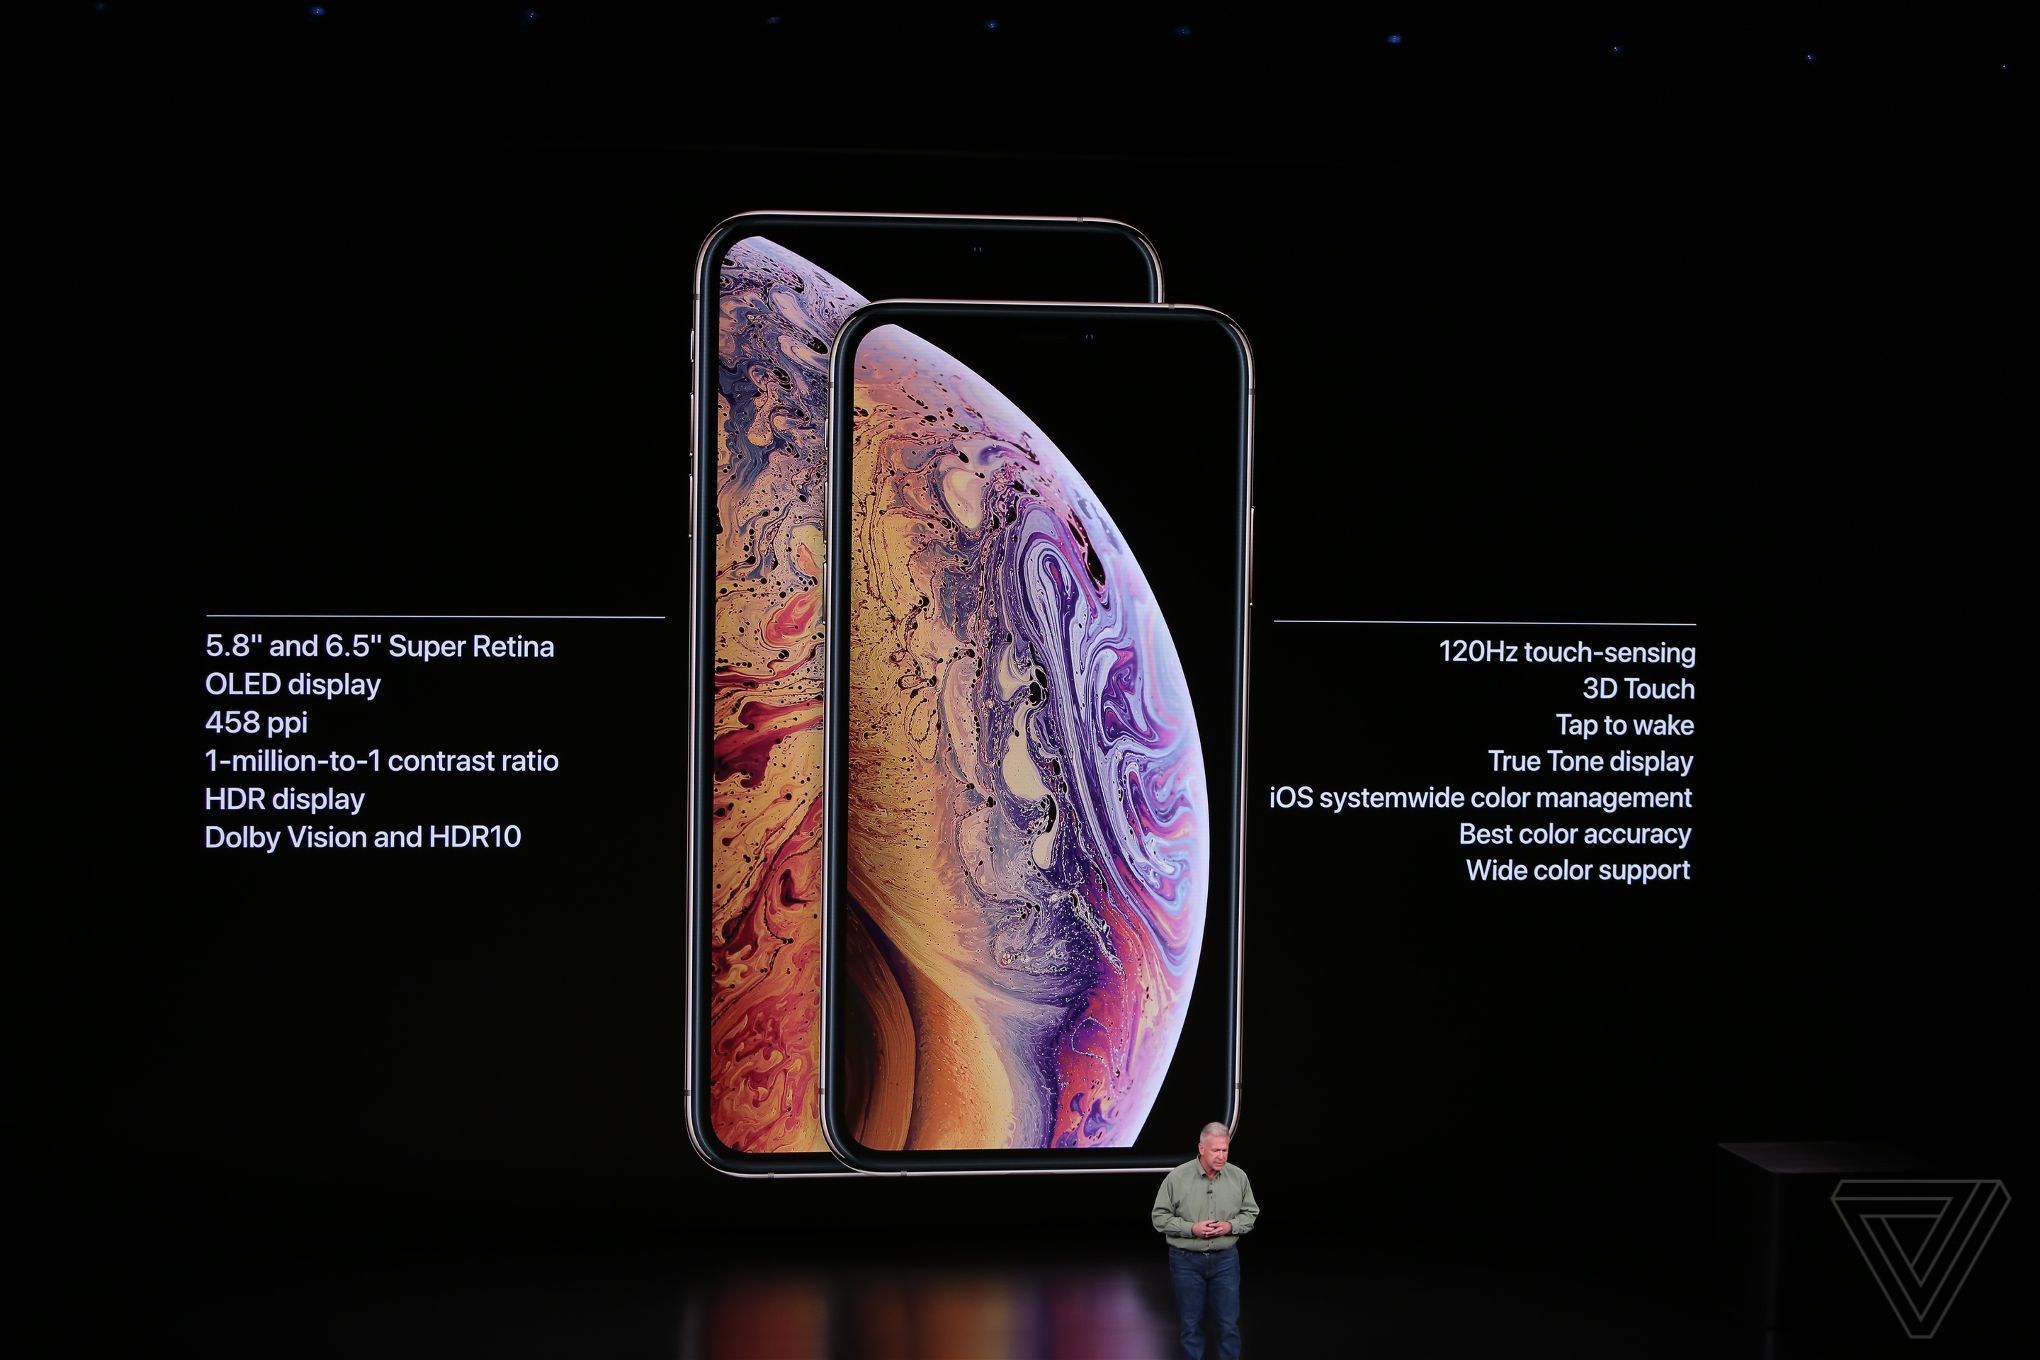 iPhone XS siiPhone XS Max ecrane